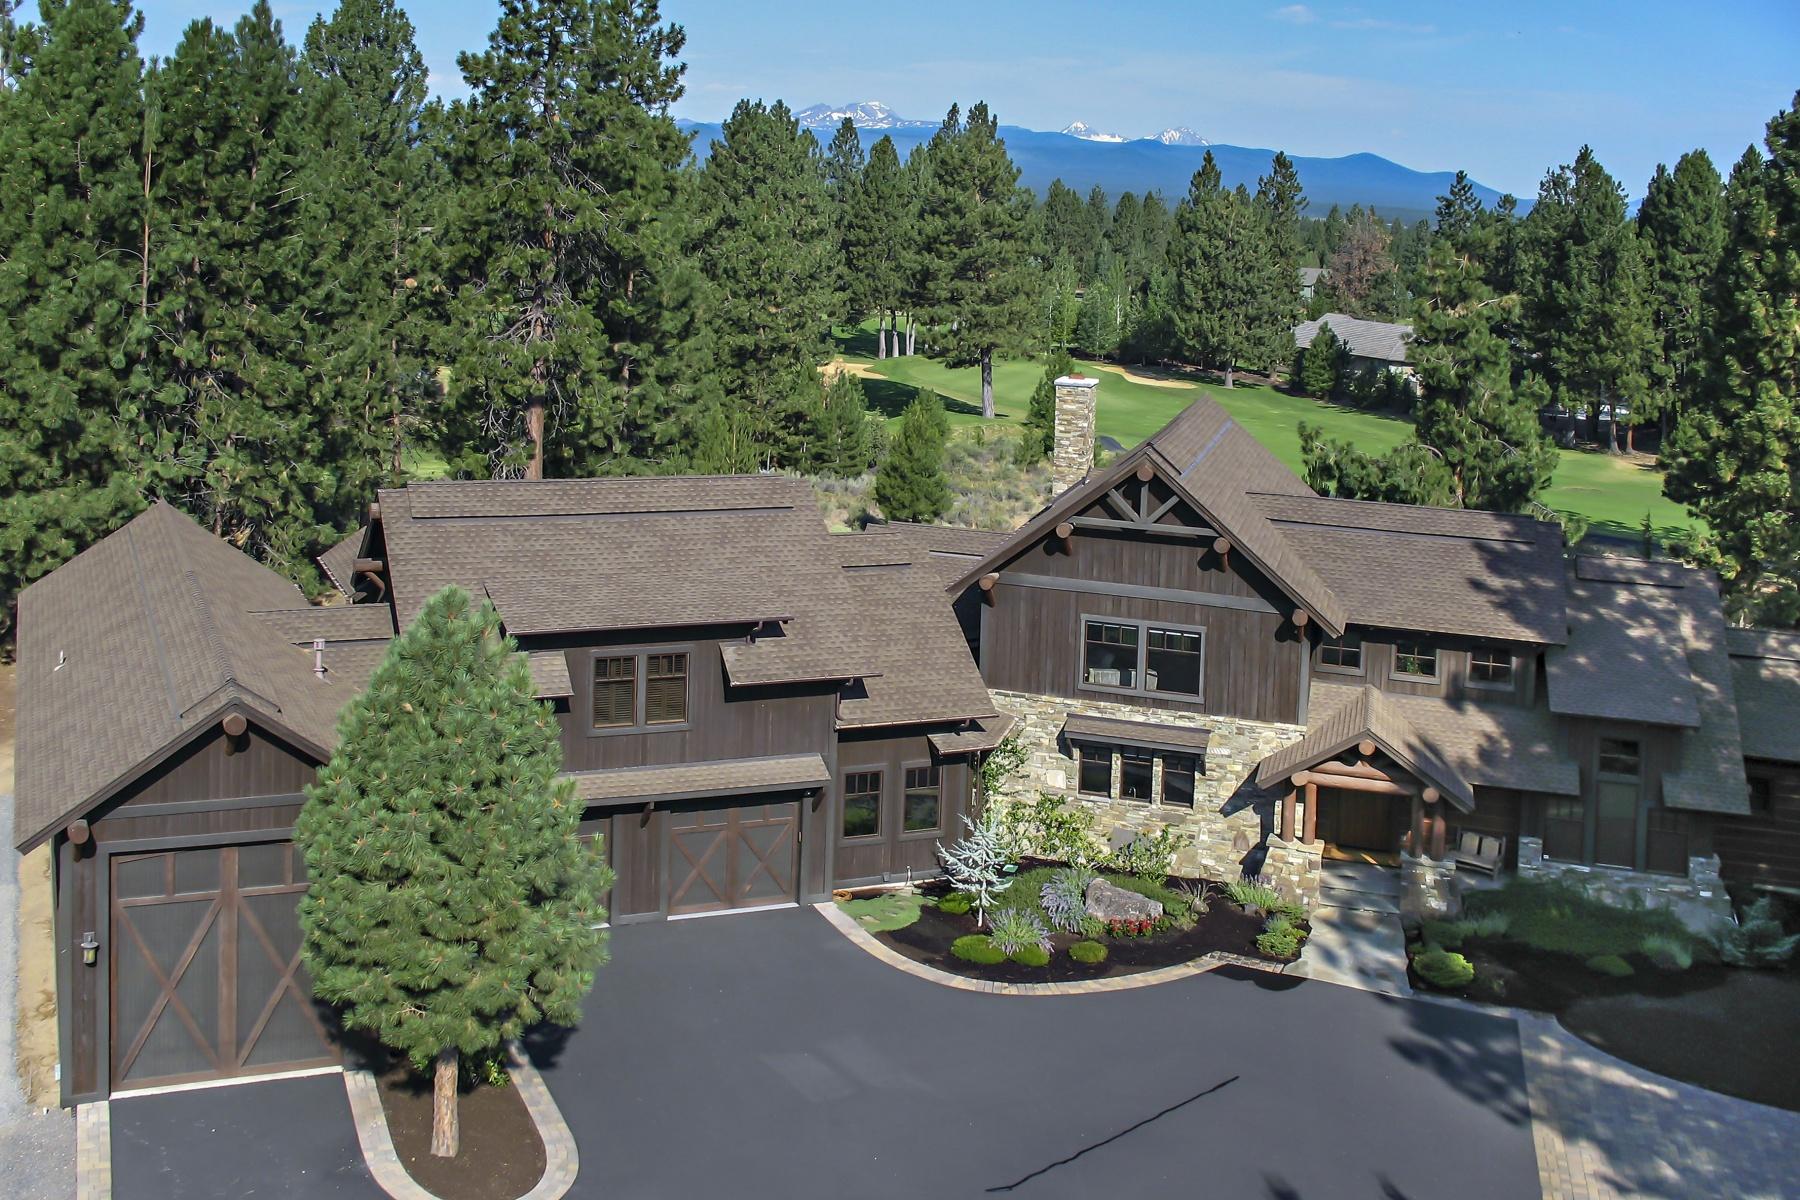 Moradia para Venda às Beautiful NW Lodge-Style Home 20275 Rainbow Lake Trl Bend, Oregon 97702 Estados Unidos